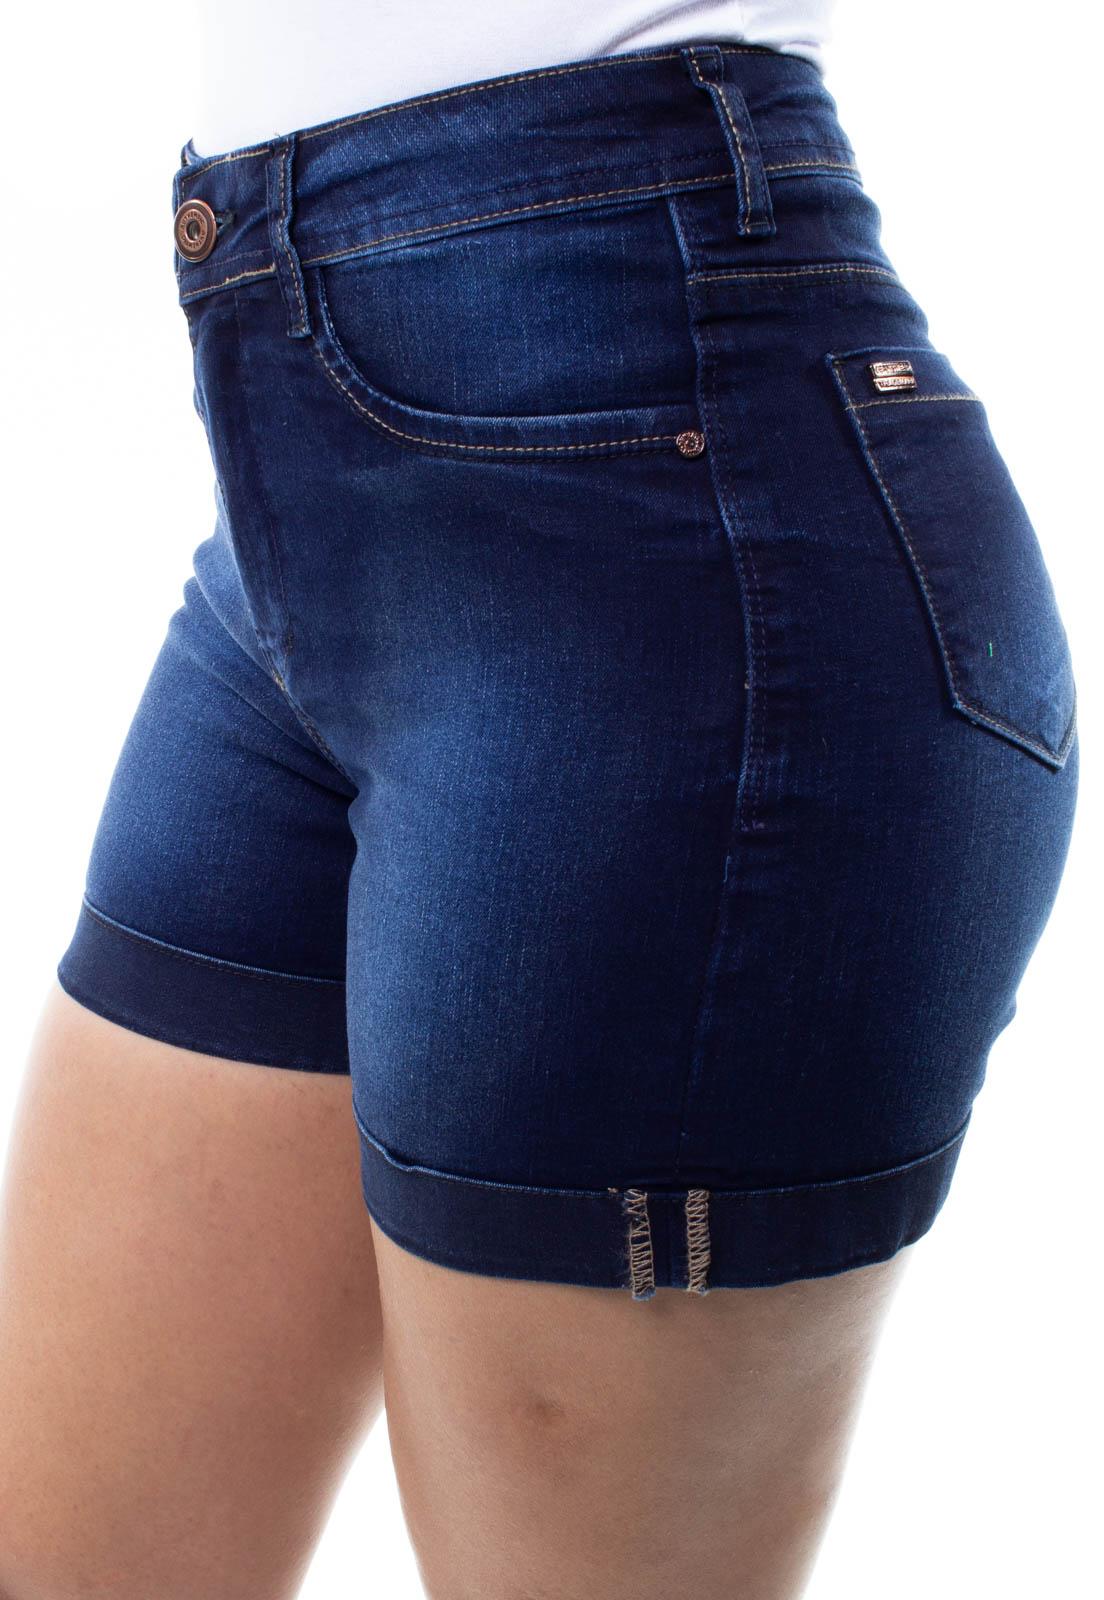 Shorts Jeans Feminino Barra Virada Crocker - 48295  - CROCKER JEANS